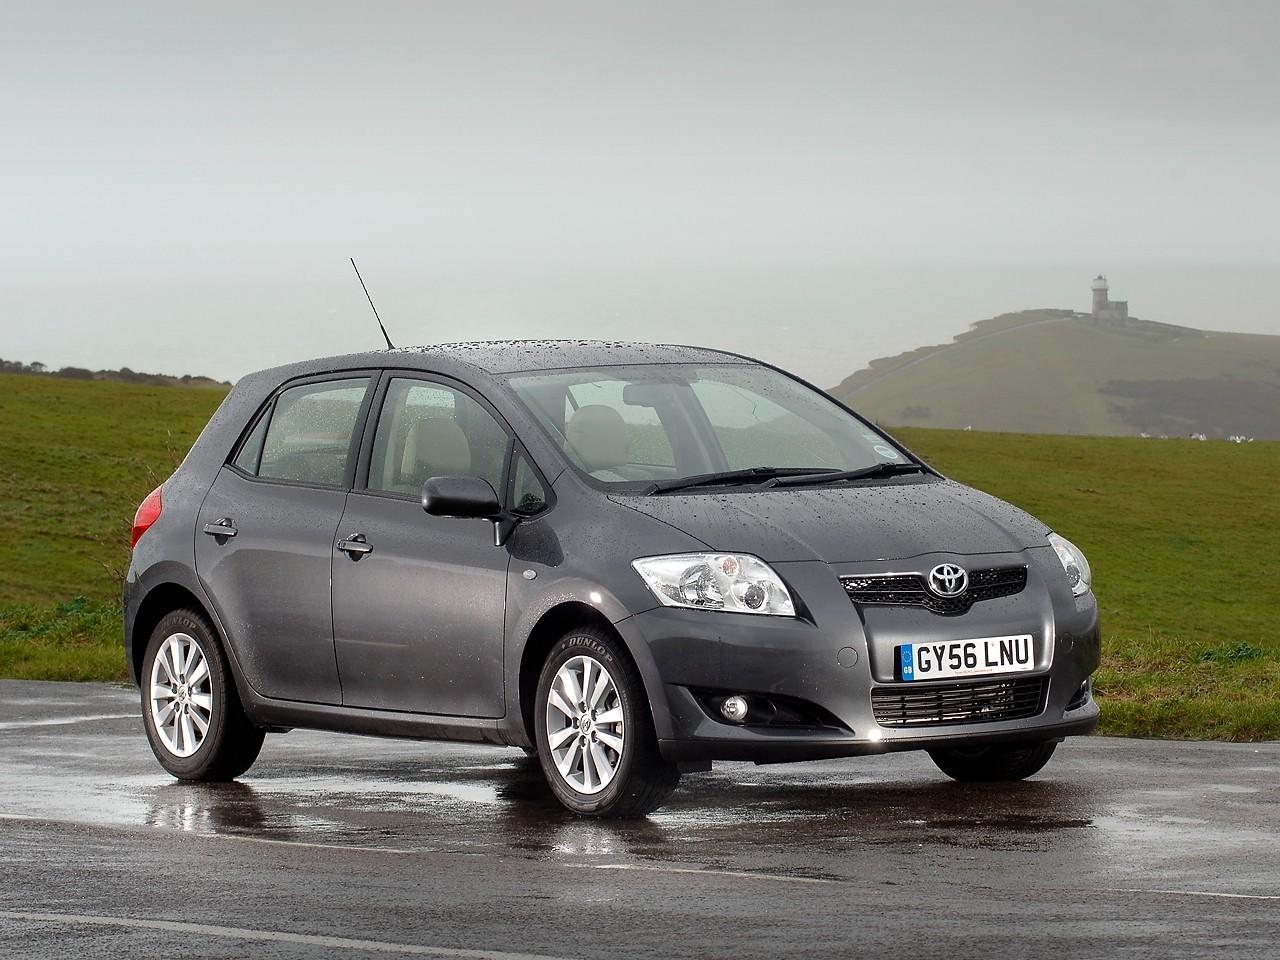 Toyota Corolla Evolution >> TOYOTA Auris 5 Doors - 2006, 2007, 2008, 2009, 2010 - autoevolution